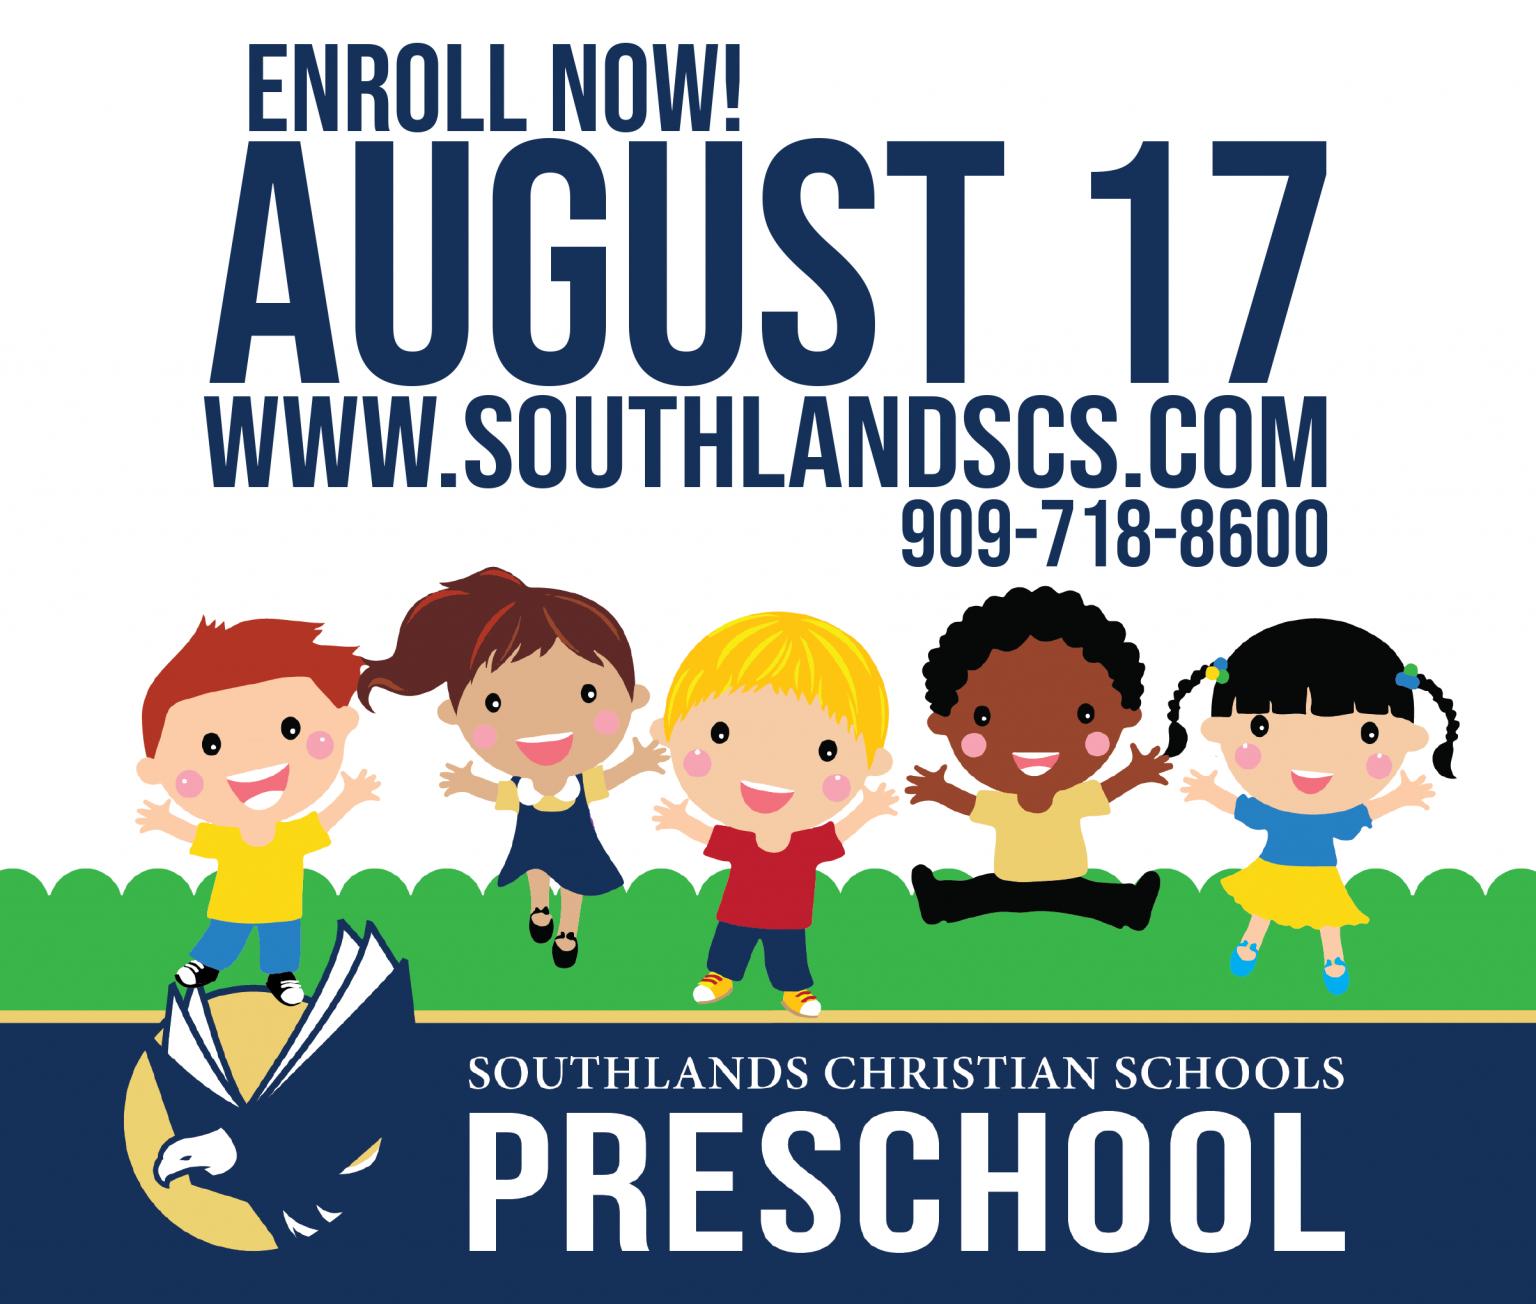 Preschool admissions